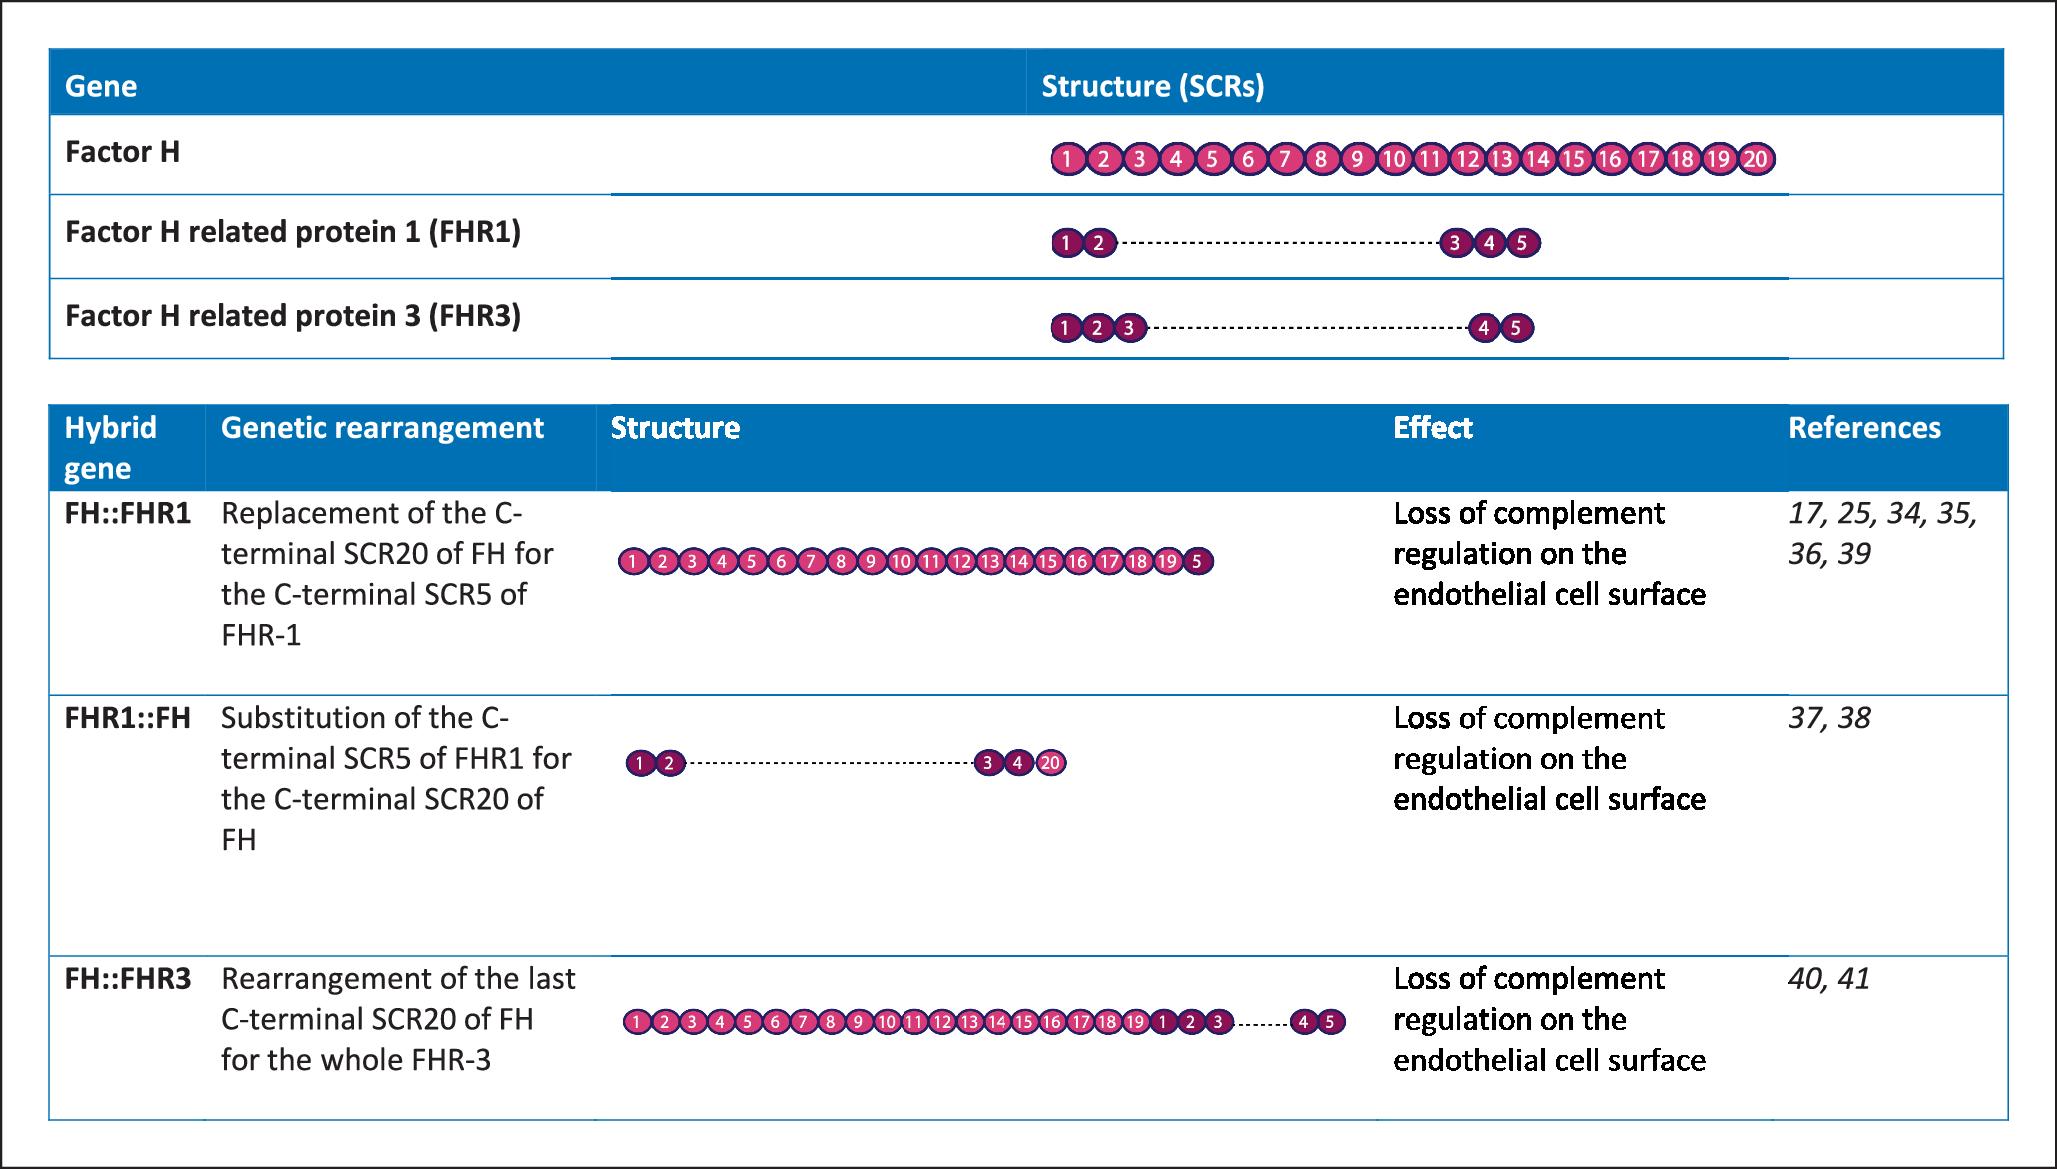 The genetics of atypical hemolytic uremic syndrome